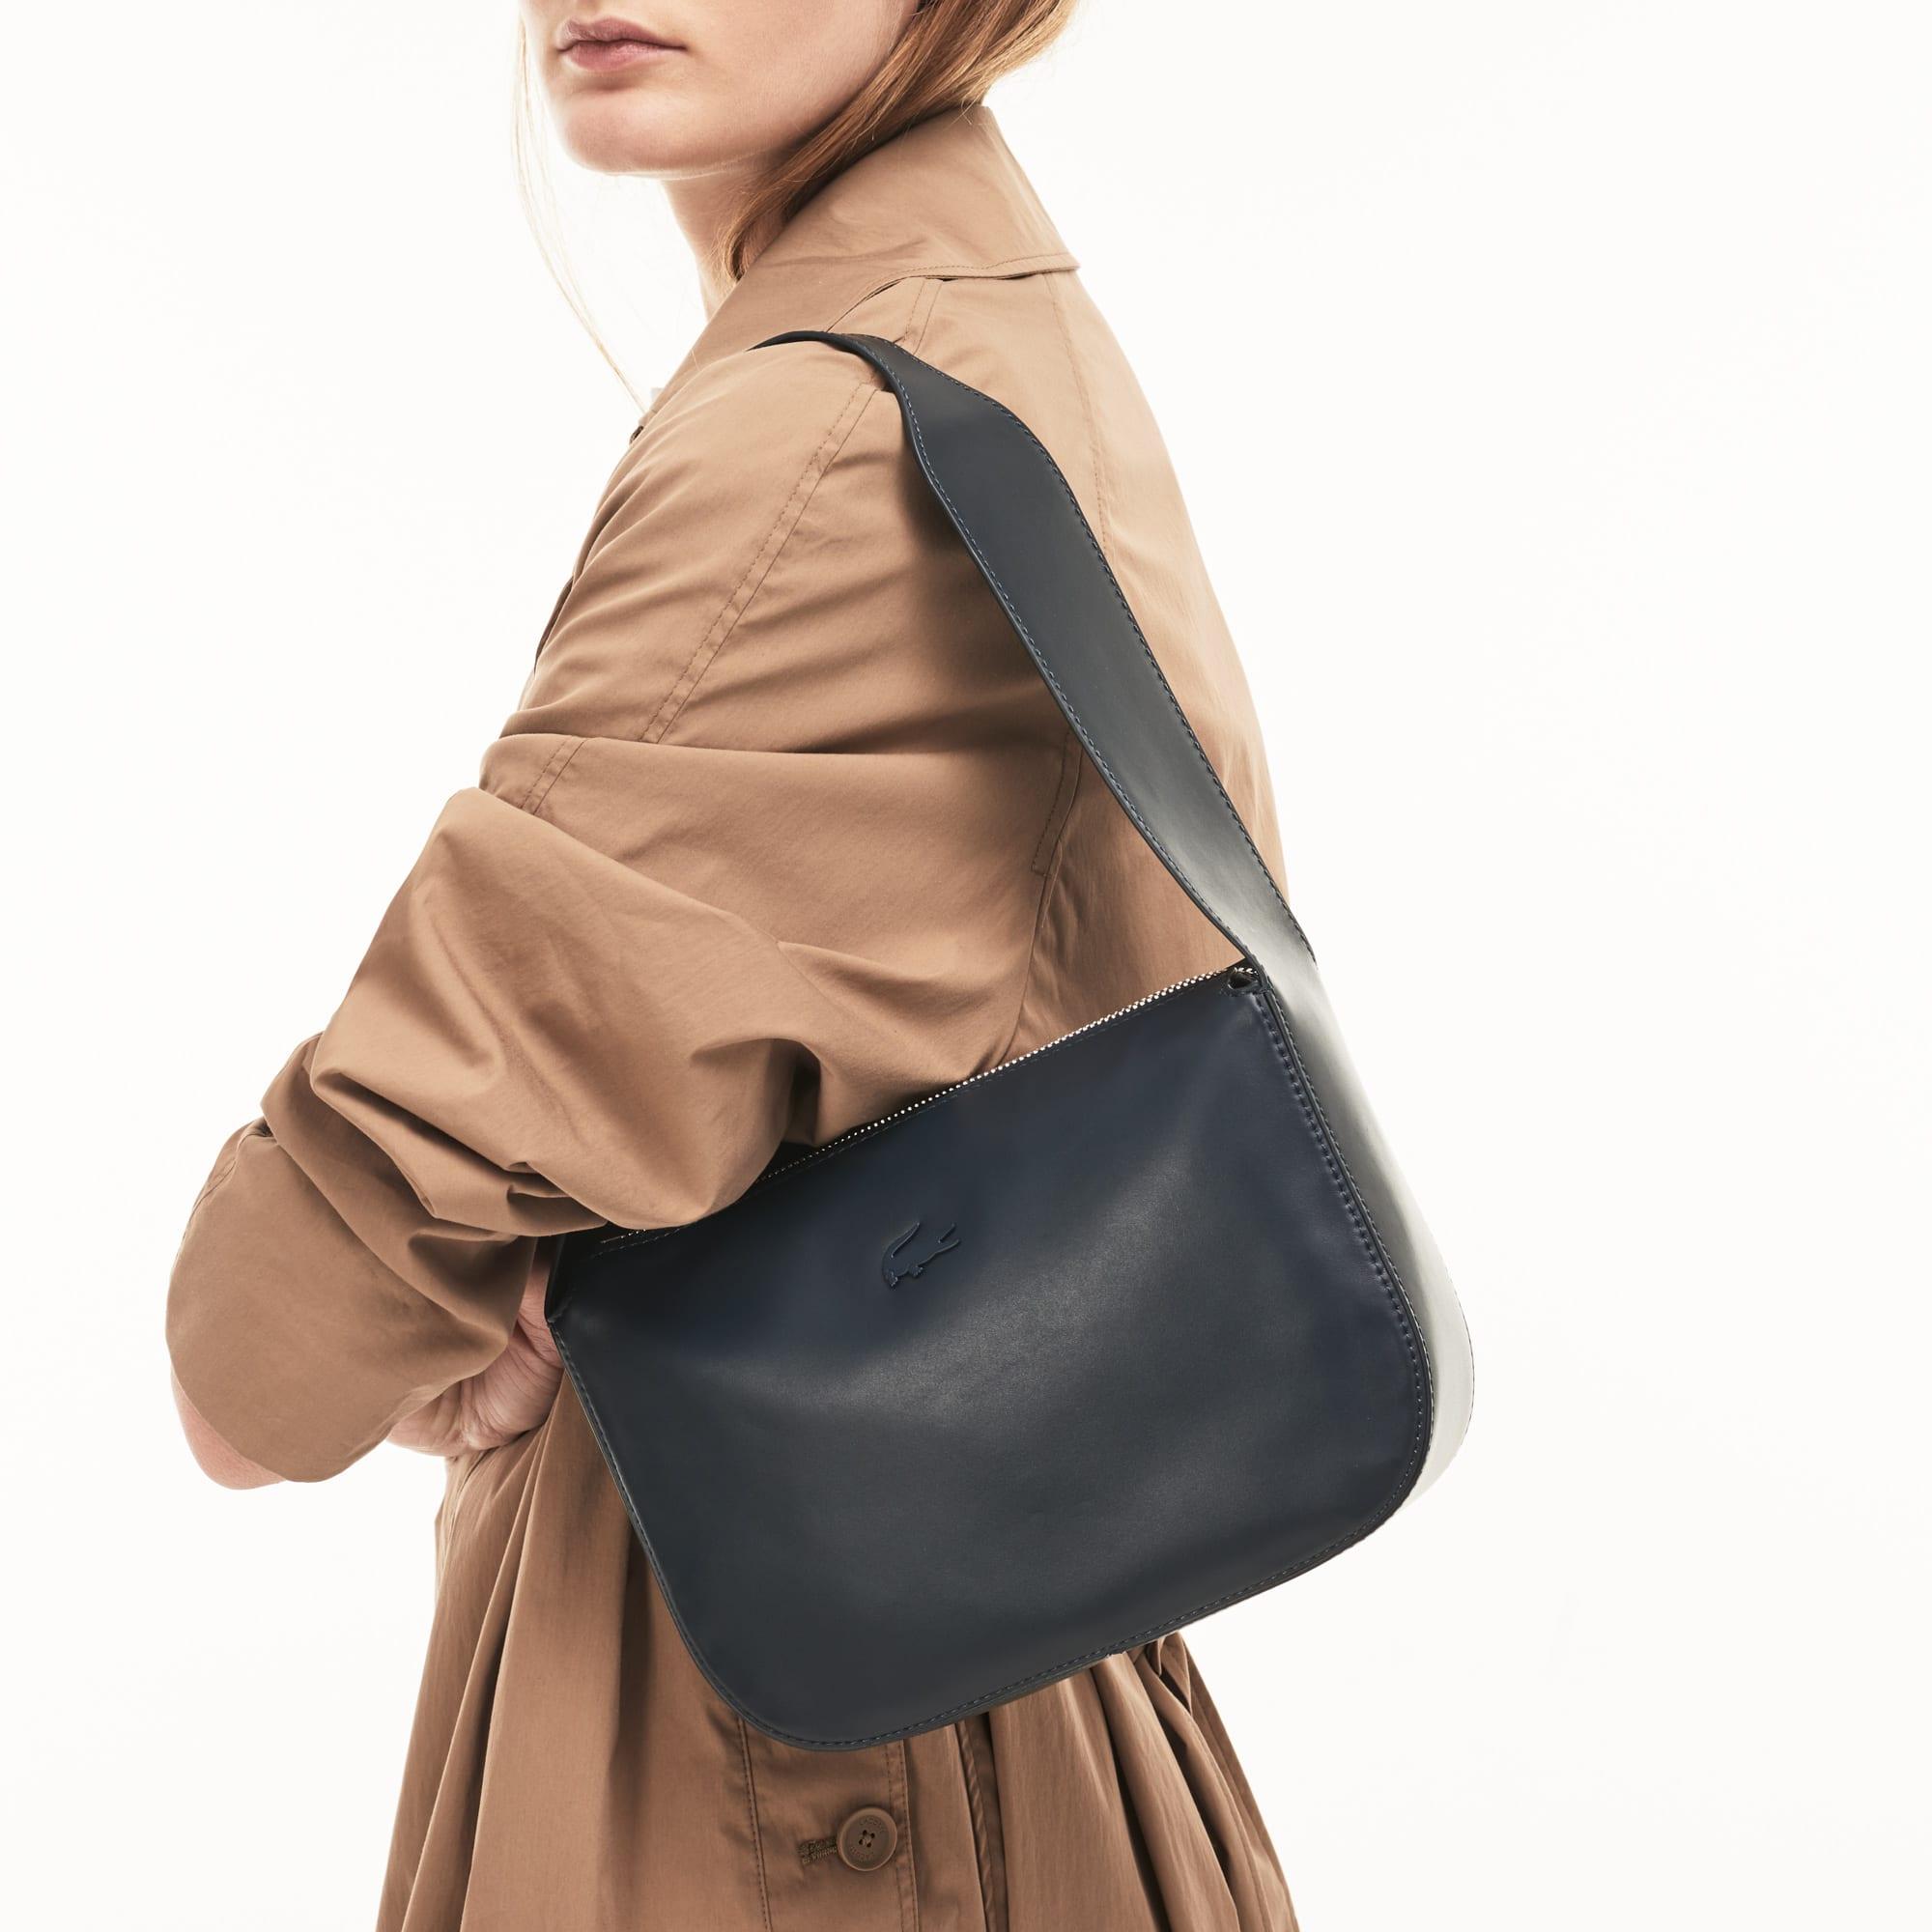 Mini sac hobo Purity en cuir souple monochrome